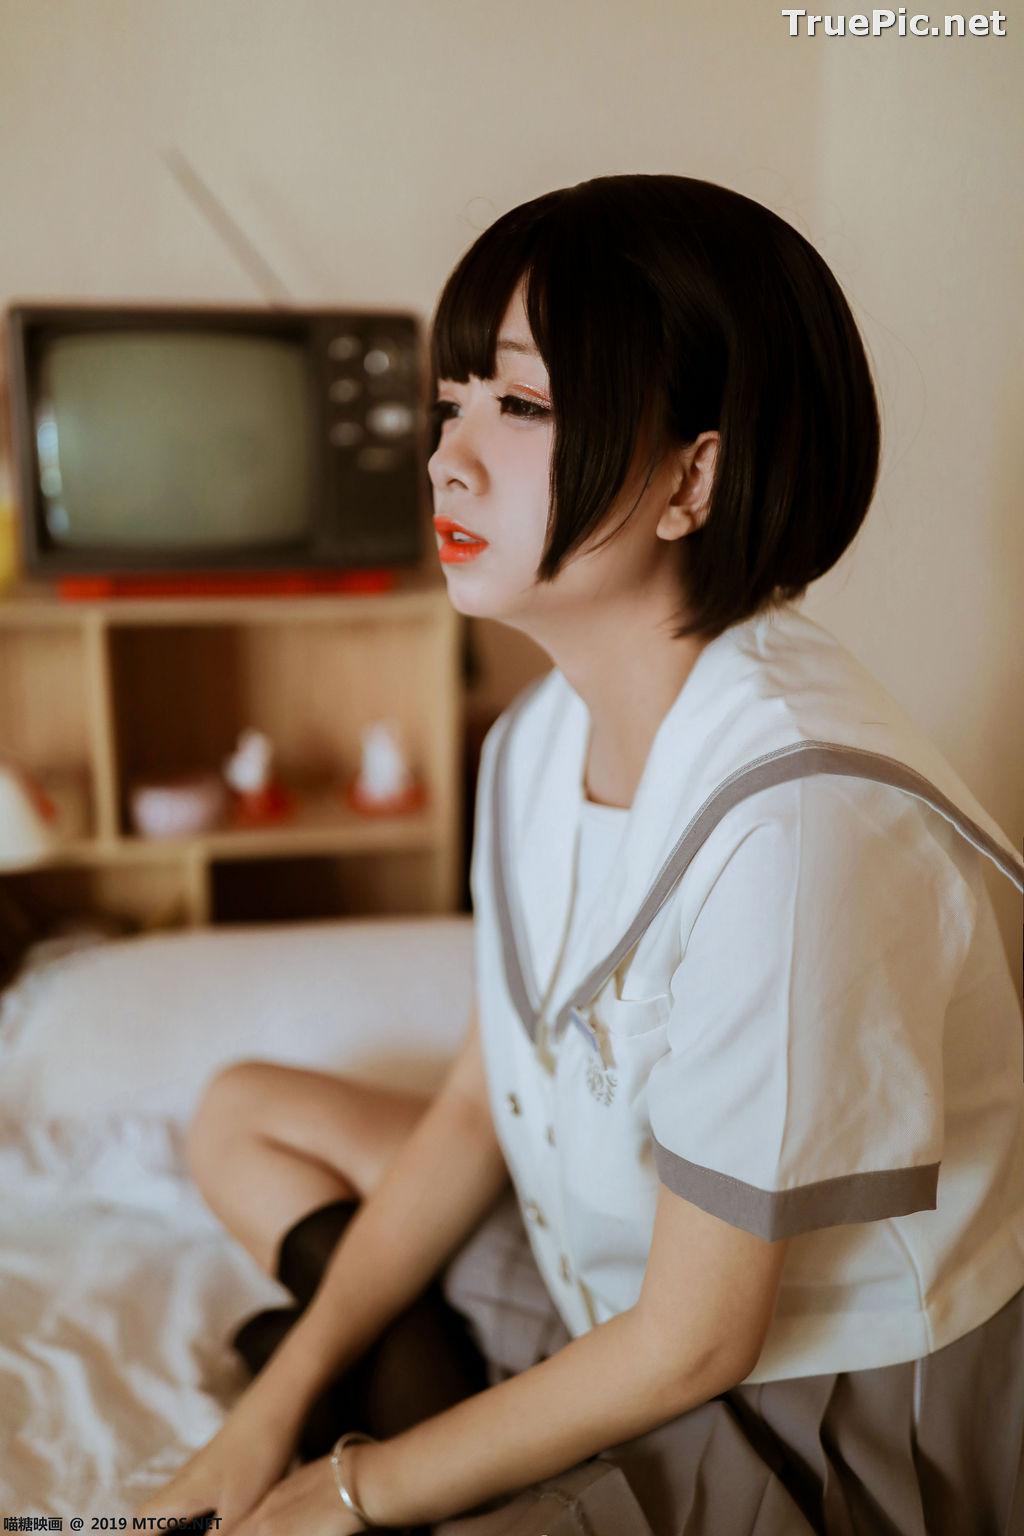 Image [MTCos] 喵糖映画 Vol.039 – Chinese Cute Model – Japanese School Uniform - TruePic.net - Picture-8